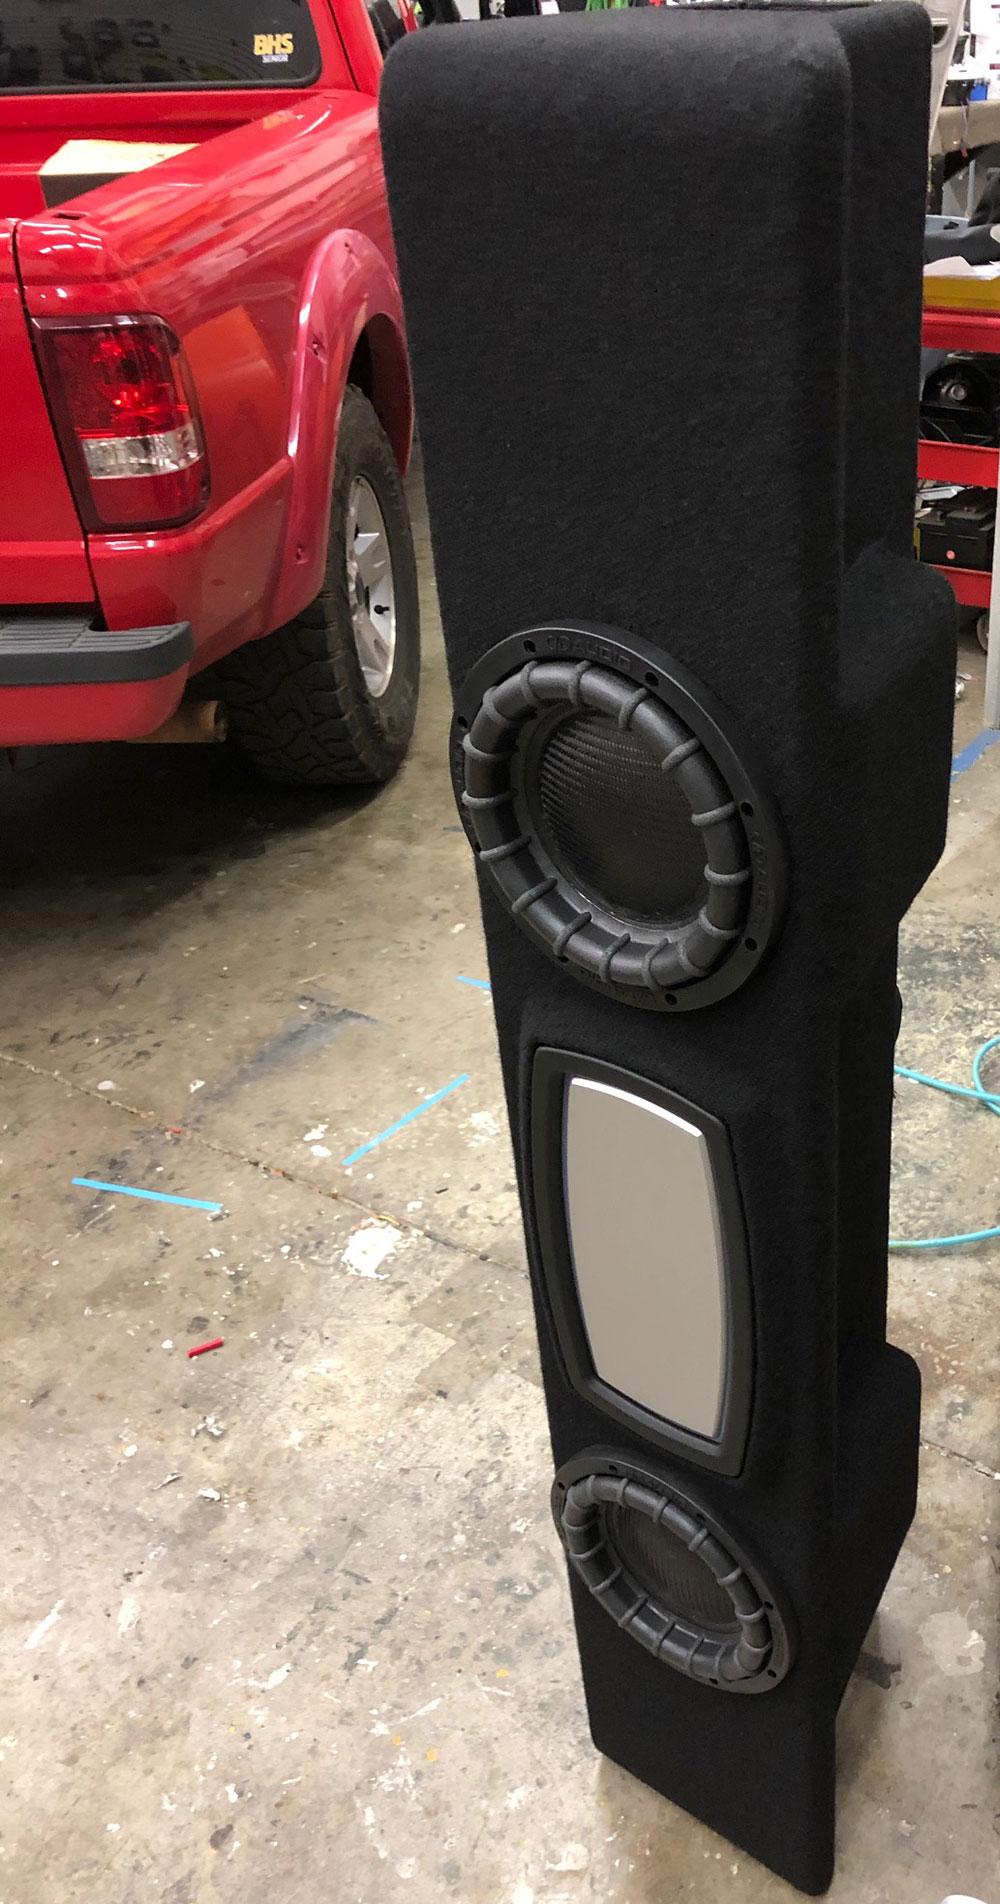 Dealer Spotlight - Speakerbox - Photo of custom Enclosure, Loaded, in Shop